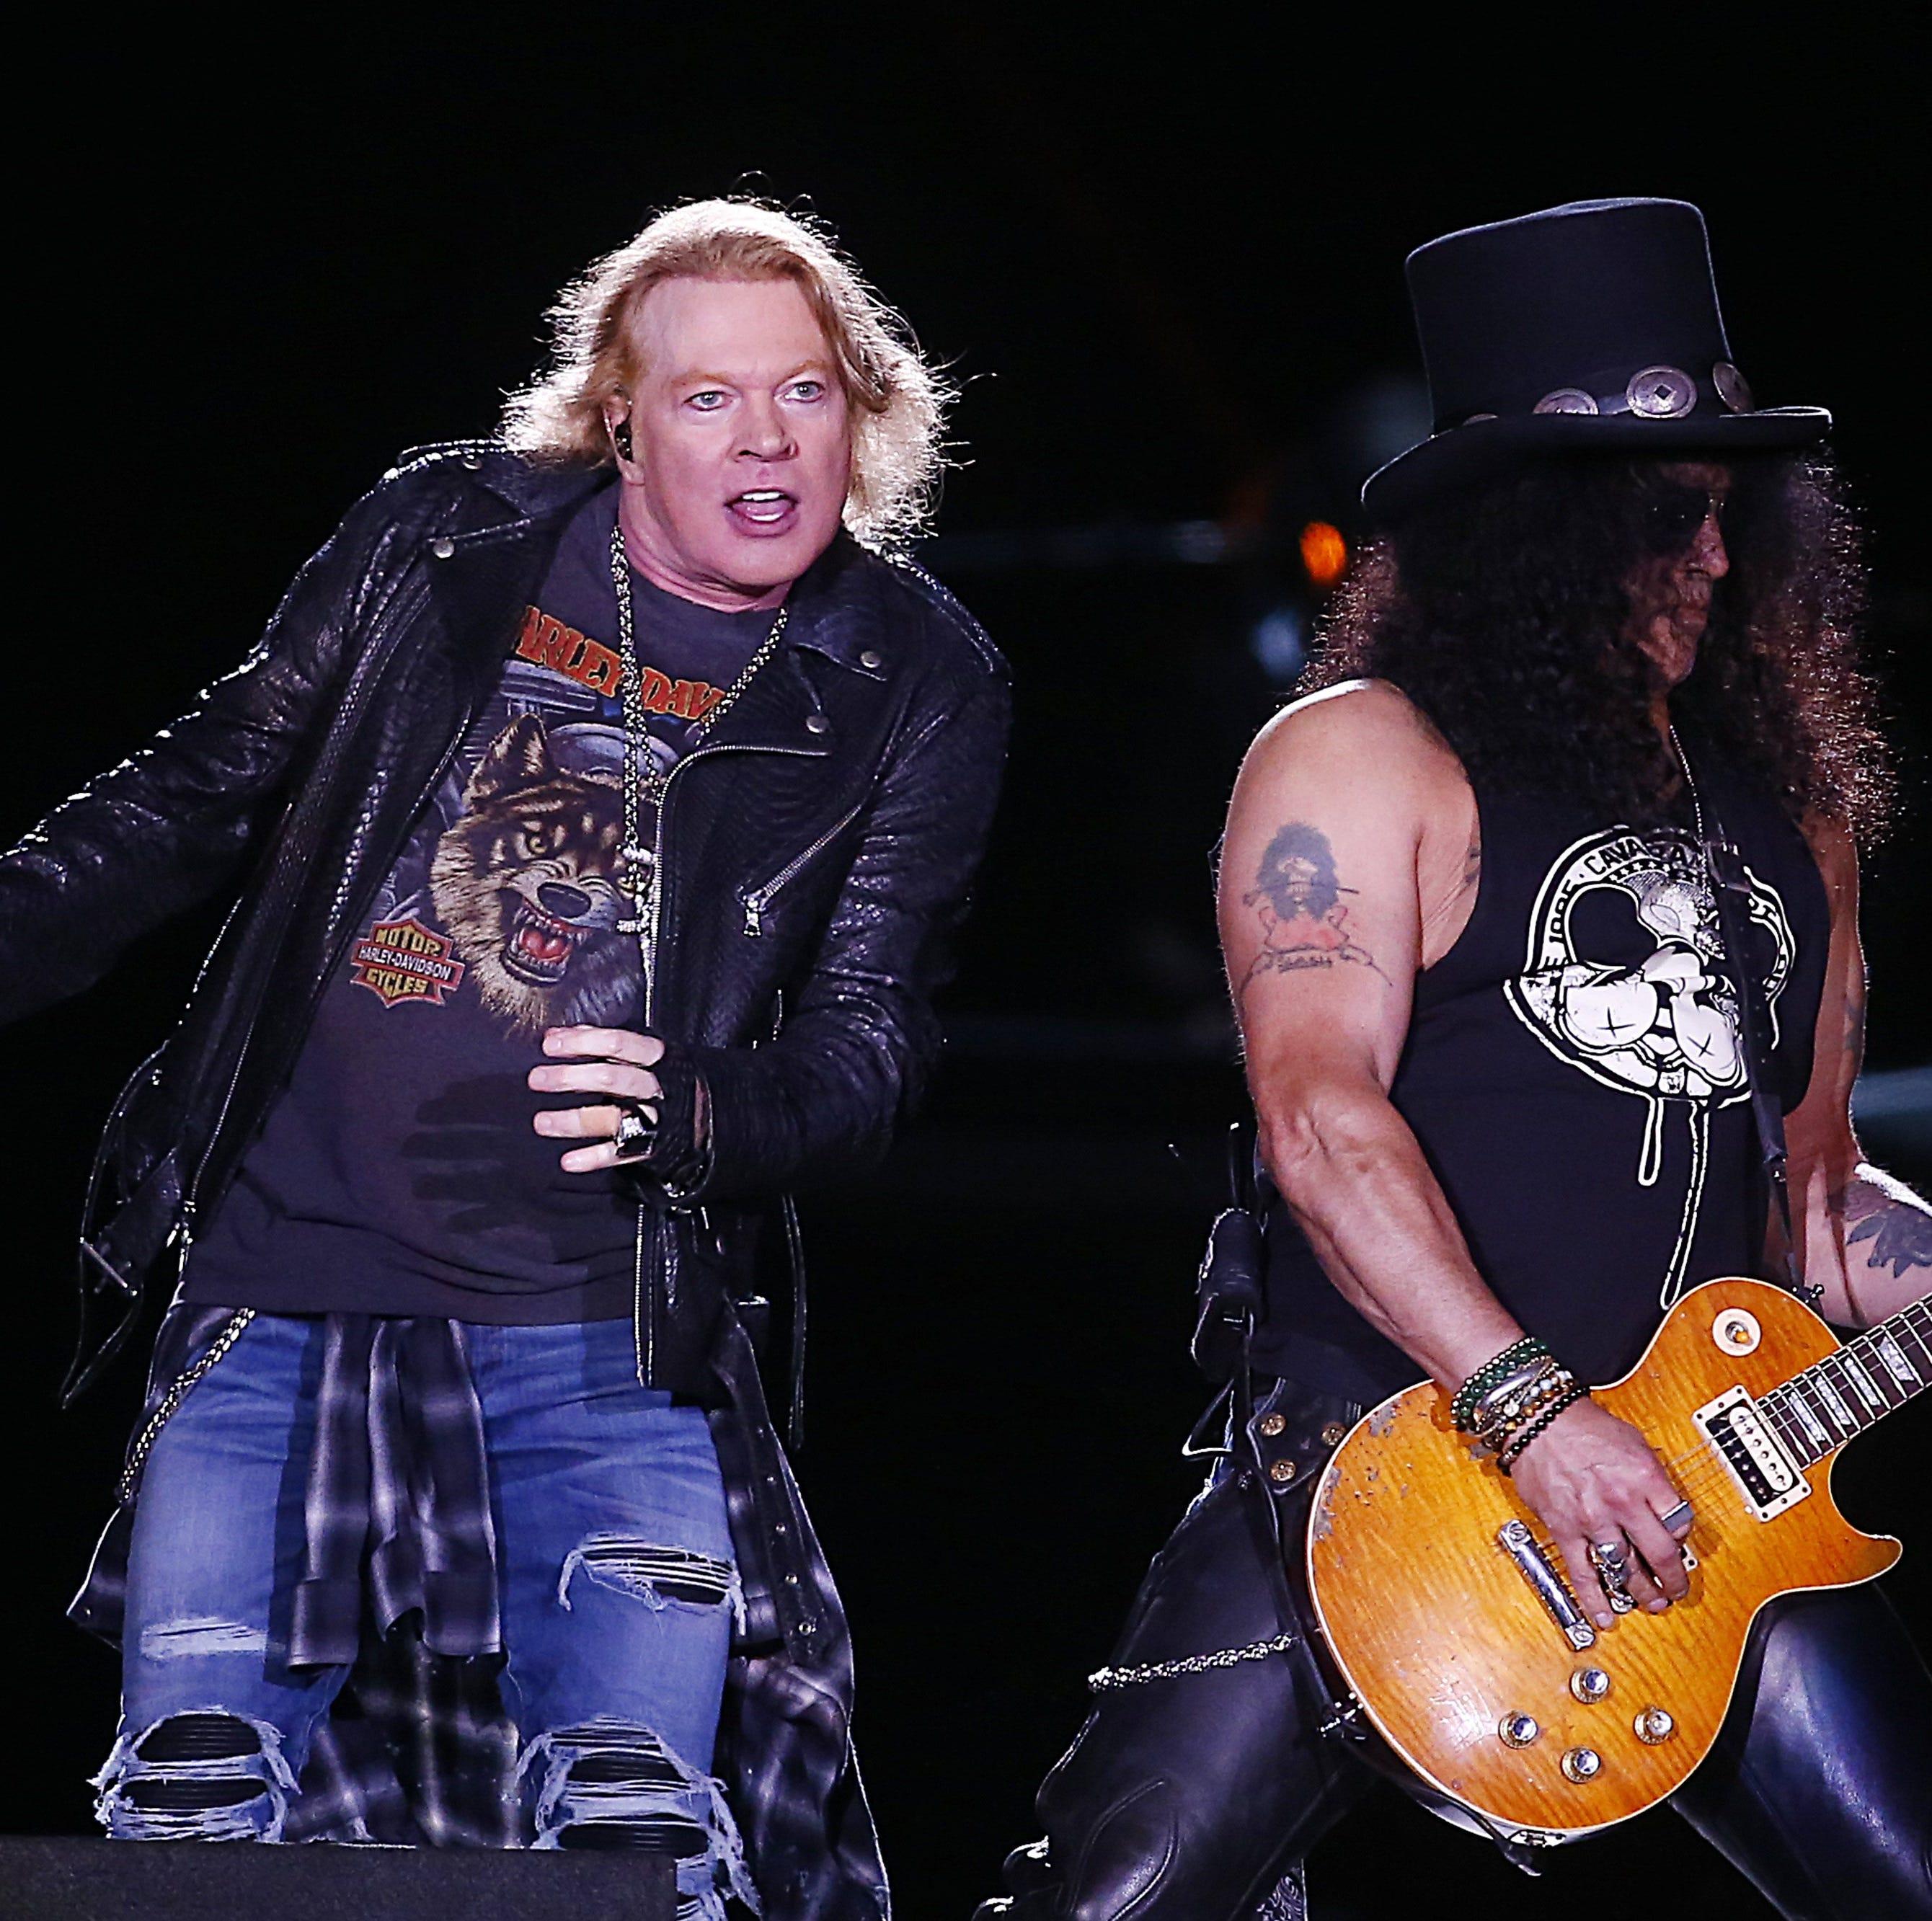 Exit 111 lineup: Guns N' Roses, Def Leppard headline Manchester, Tenn. rock fest